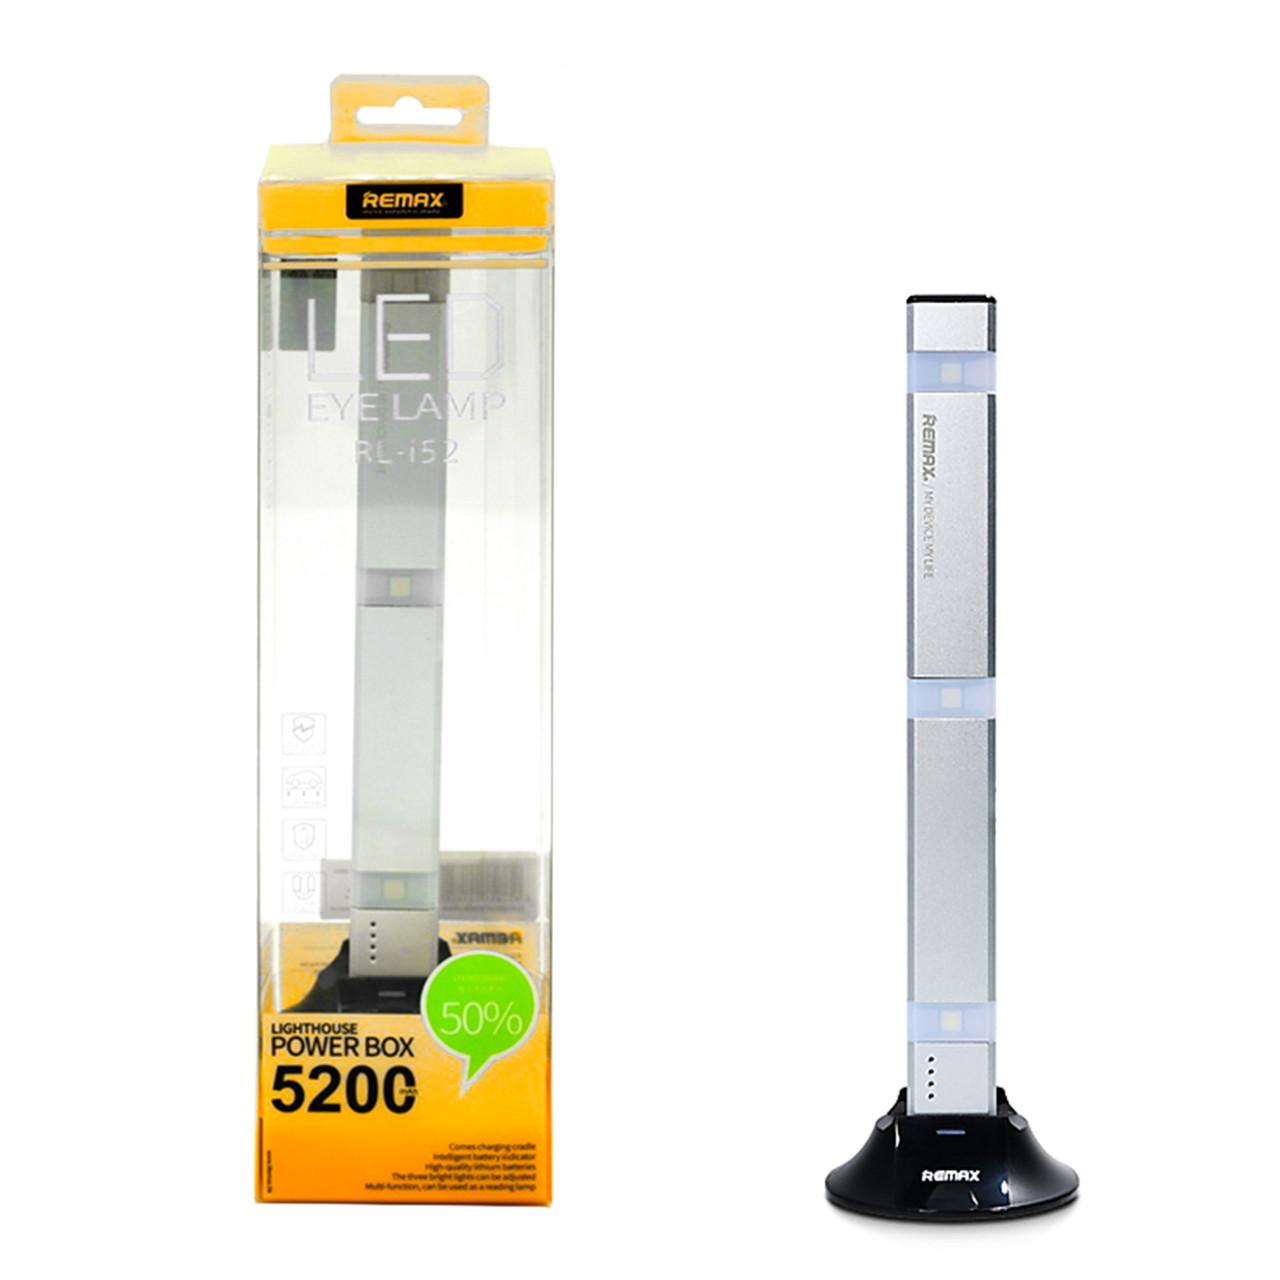 Power Bank Remax lghthose Led Lamp + power box 5200 Silver